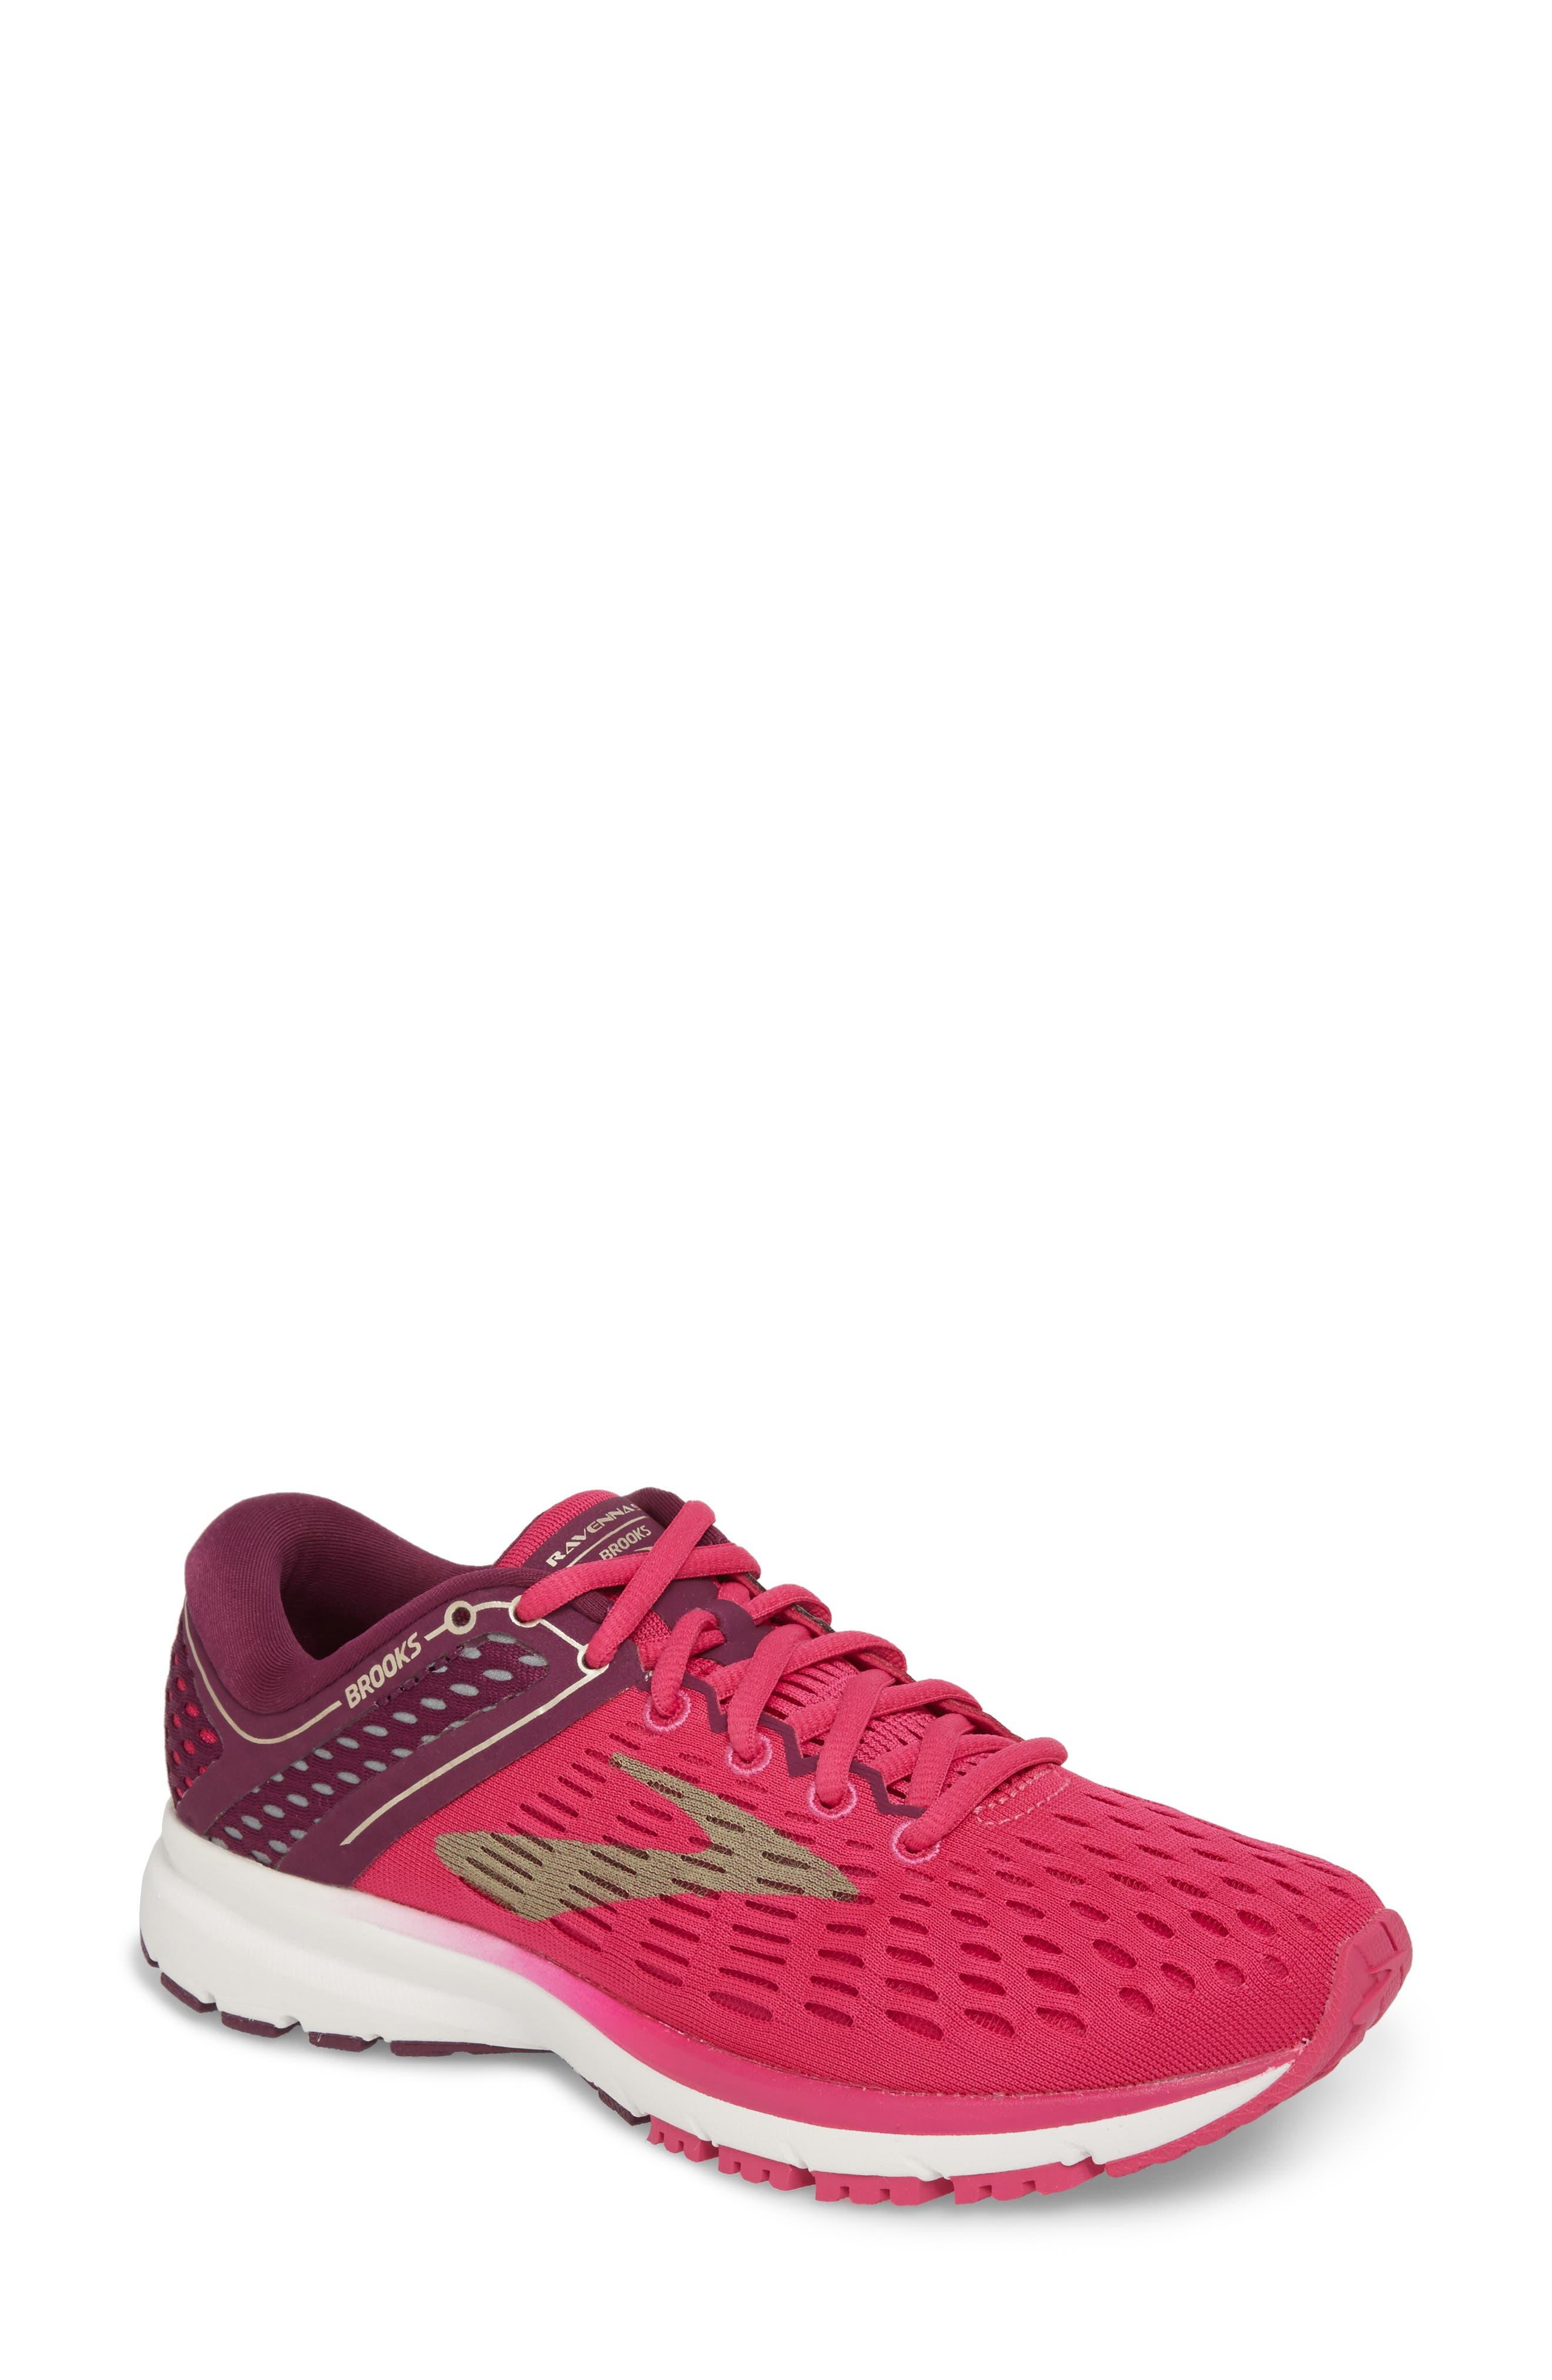 Ravenna 9 Running Shoe,                             Main thumbnail 1, color,                             Pink/ Plum/ Champagne